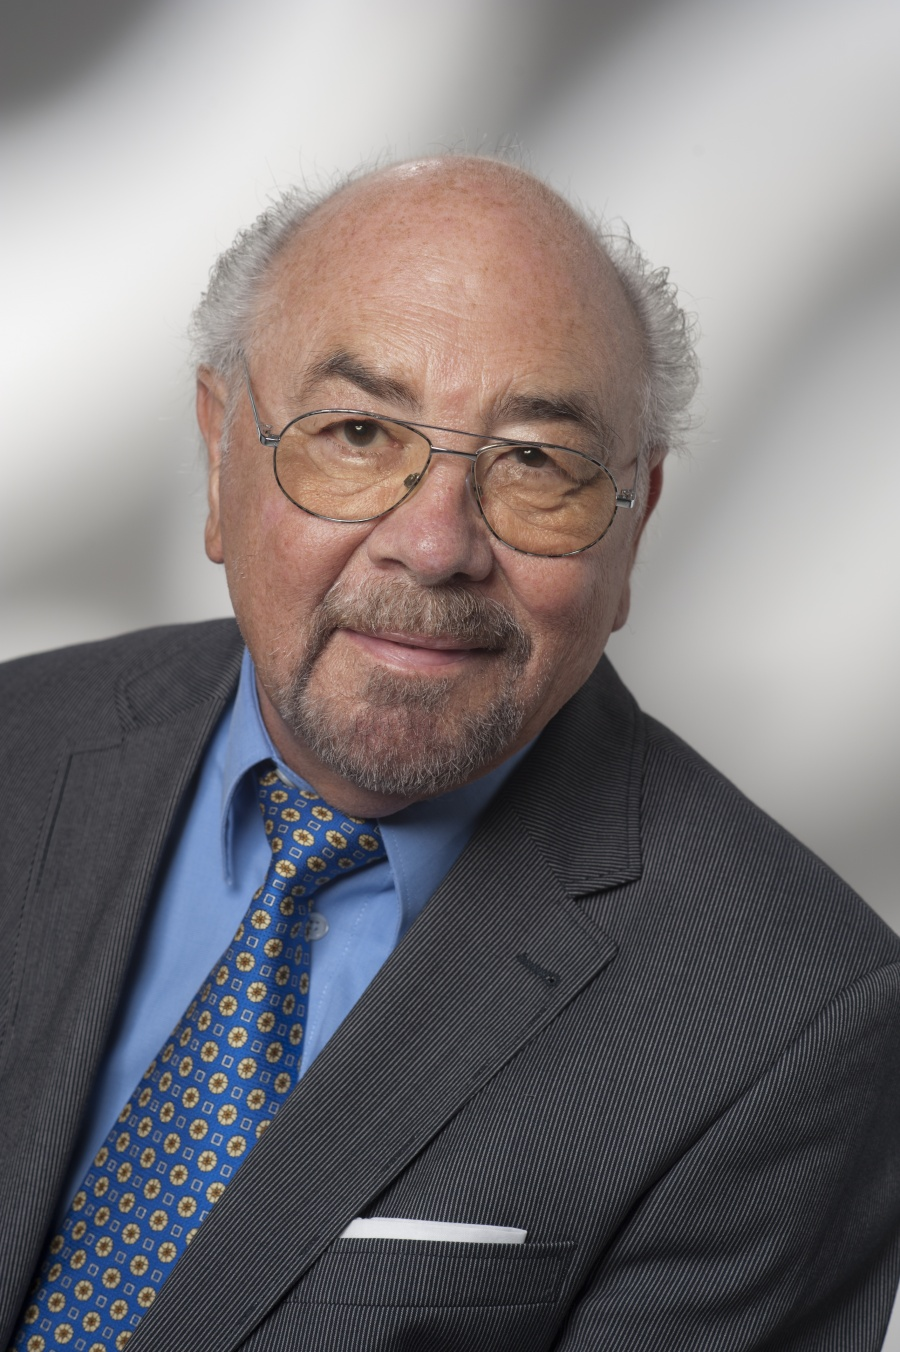 Josef Heil